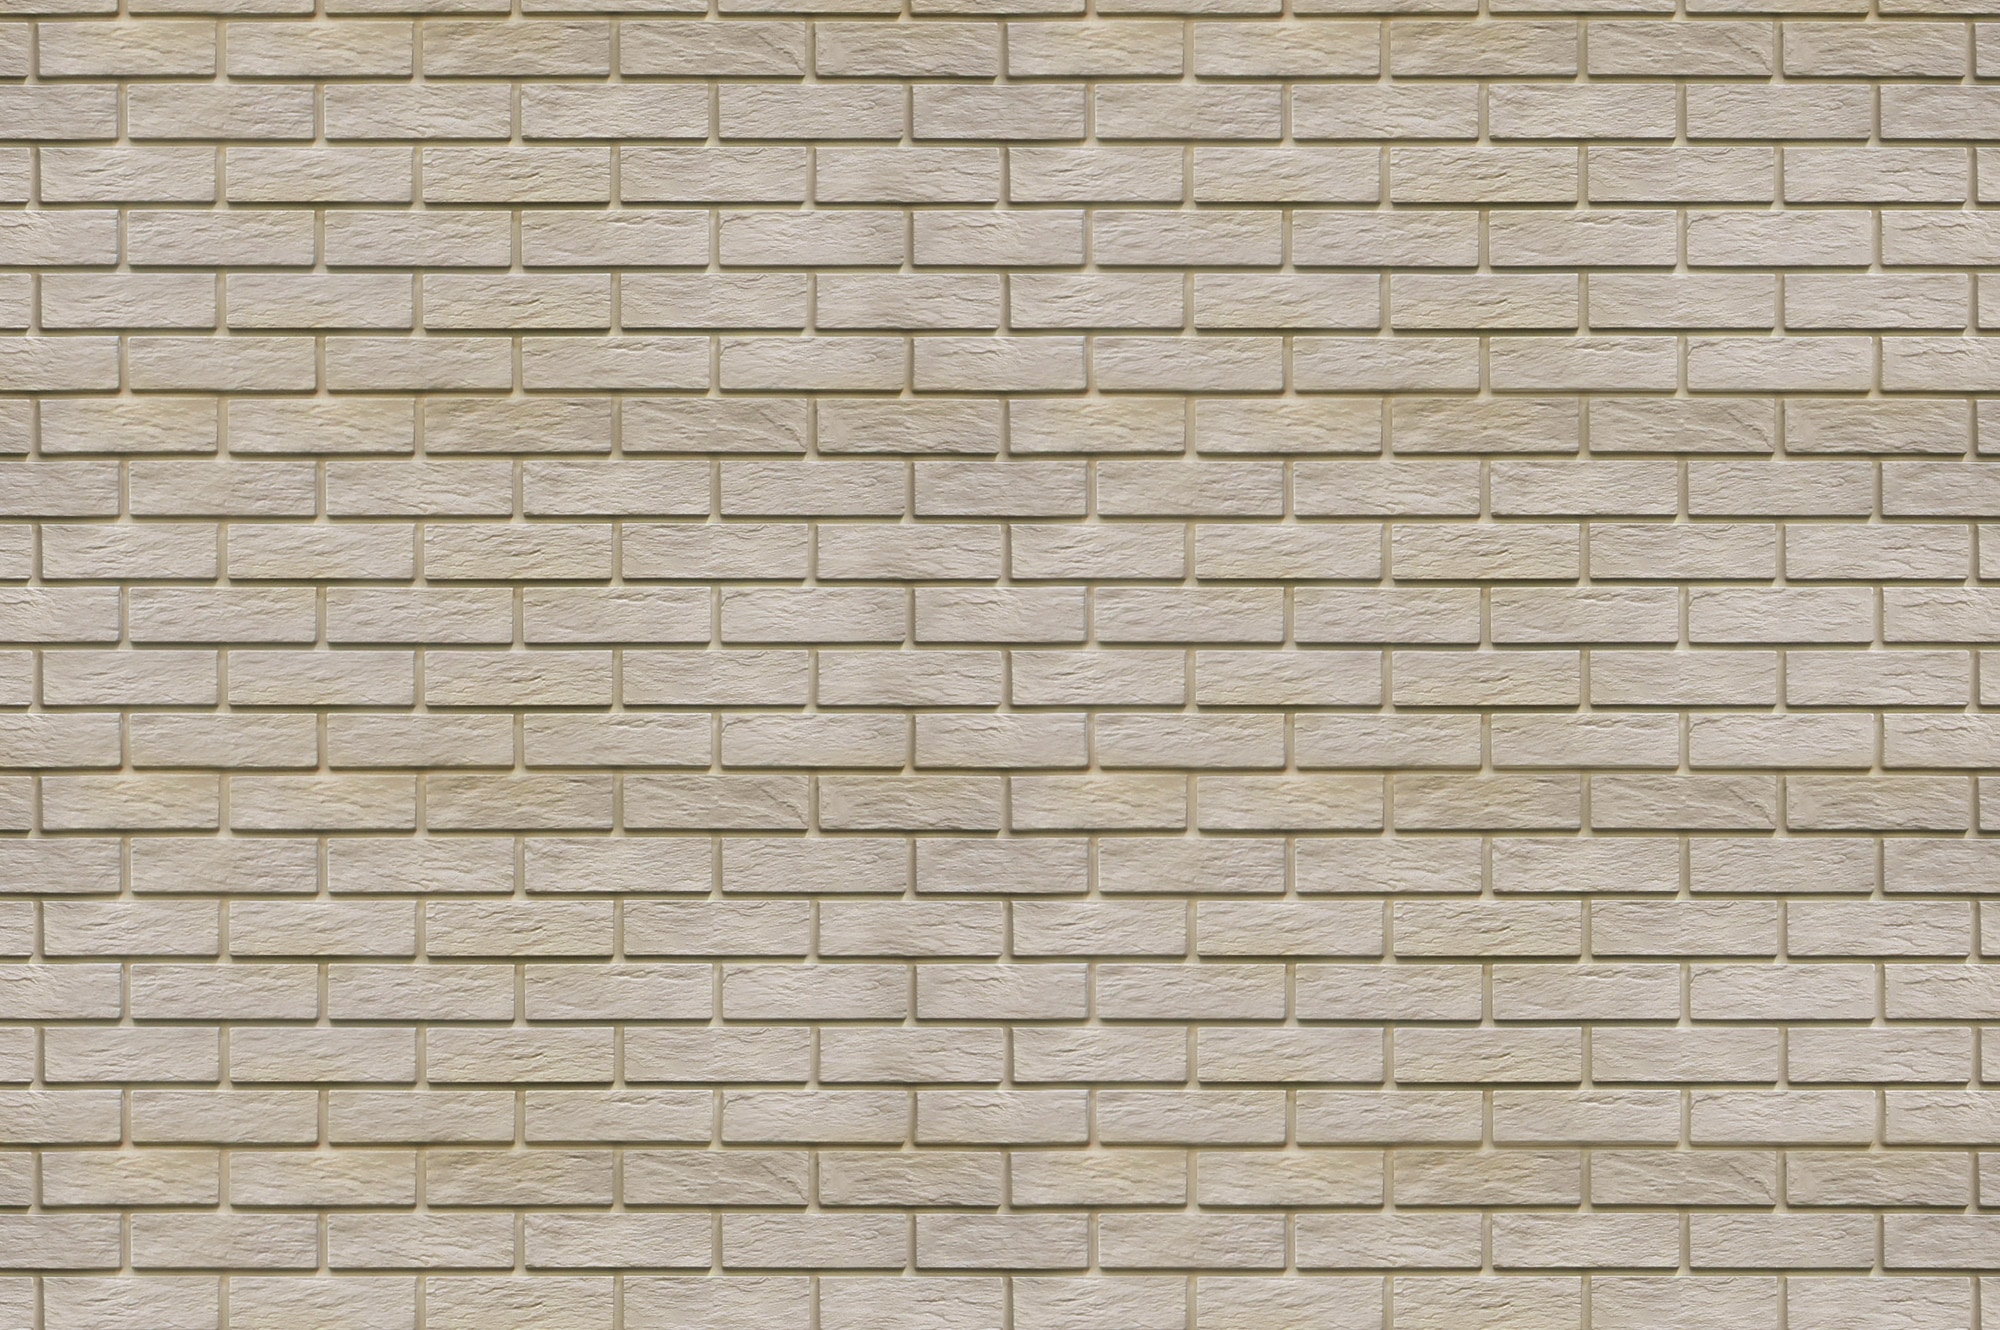 Brick Siding Panels